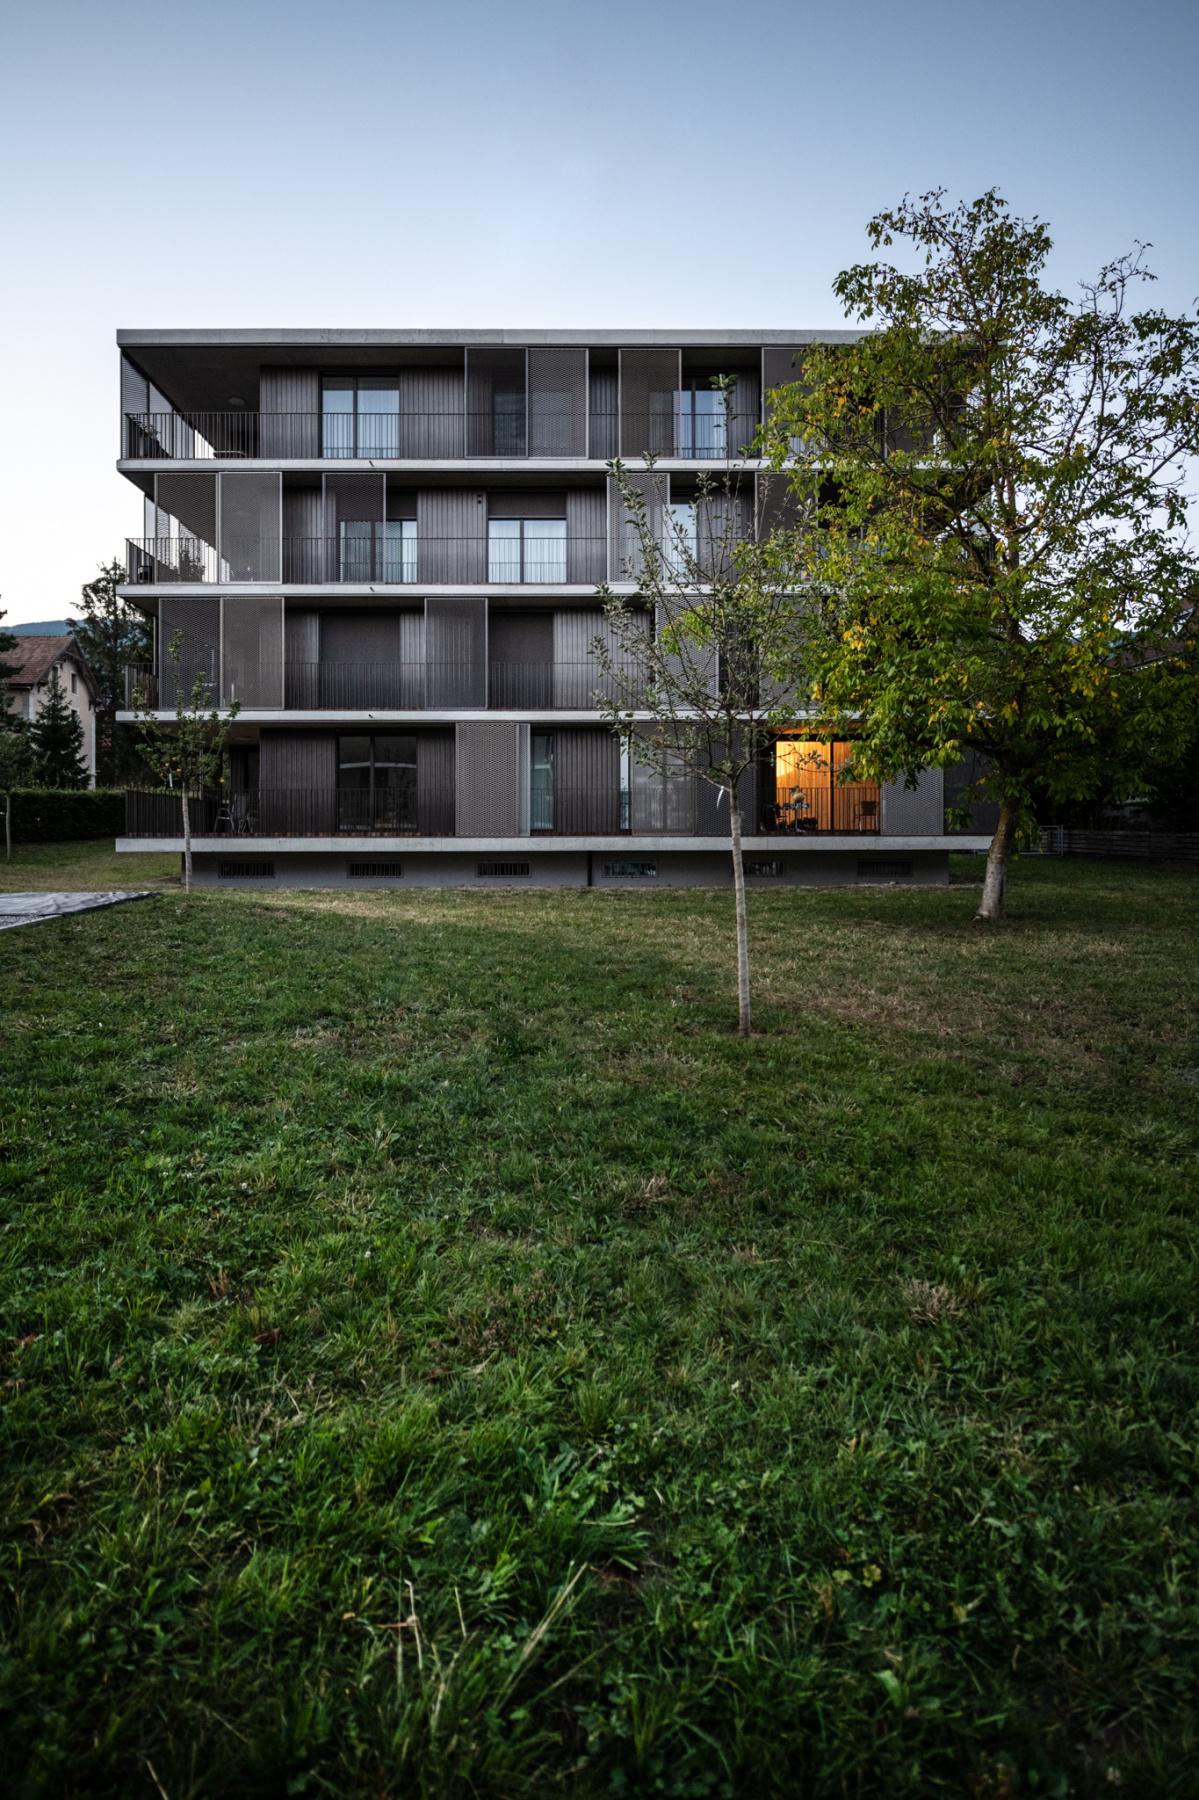 ssm-Chutz Langendorf 13